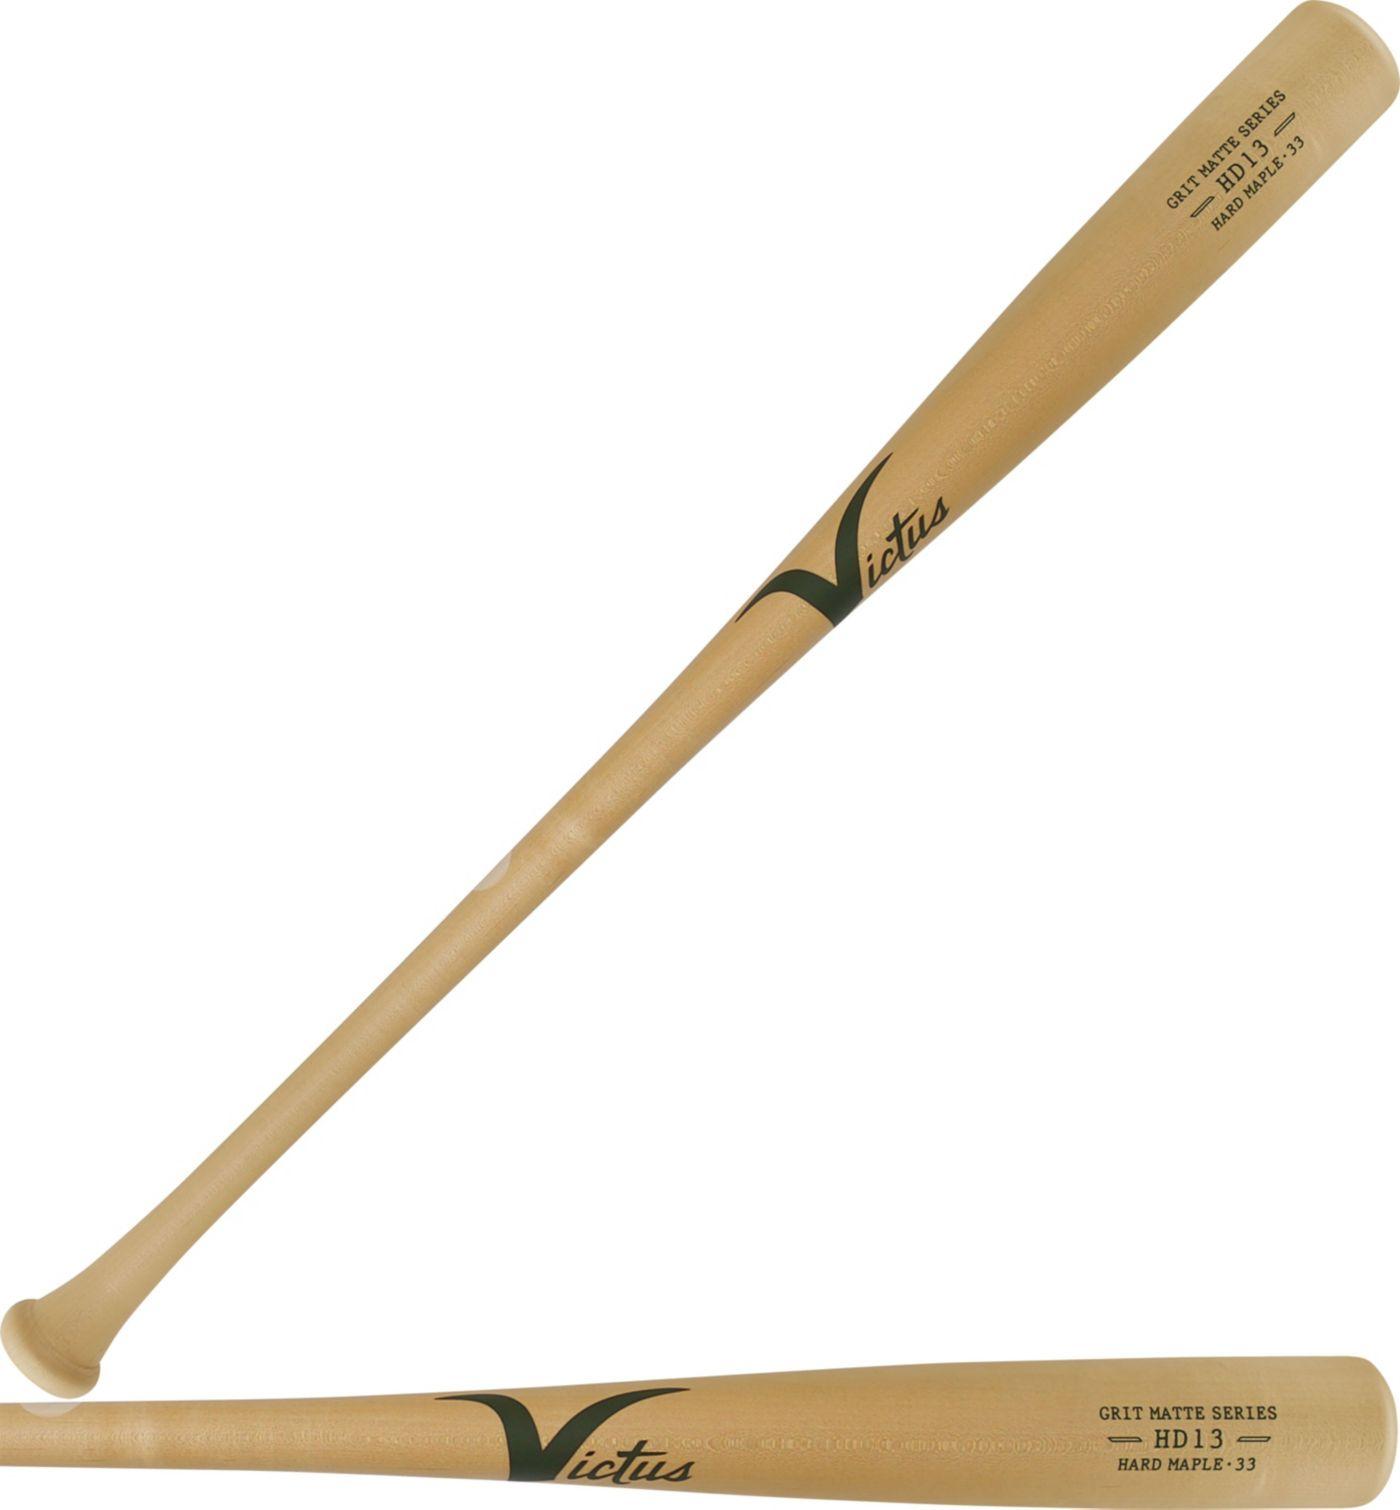 Victus Pro Reserve HD13 Maple Bat